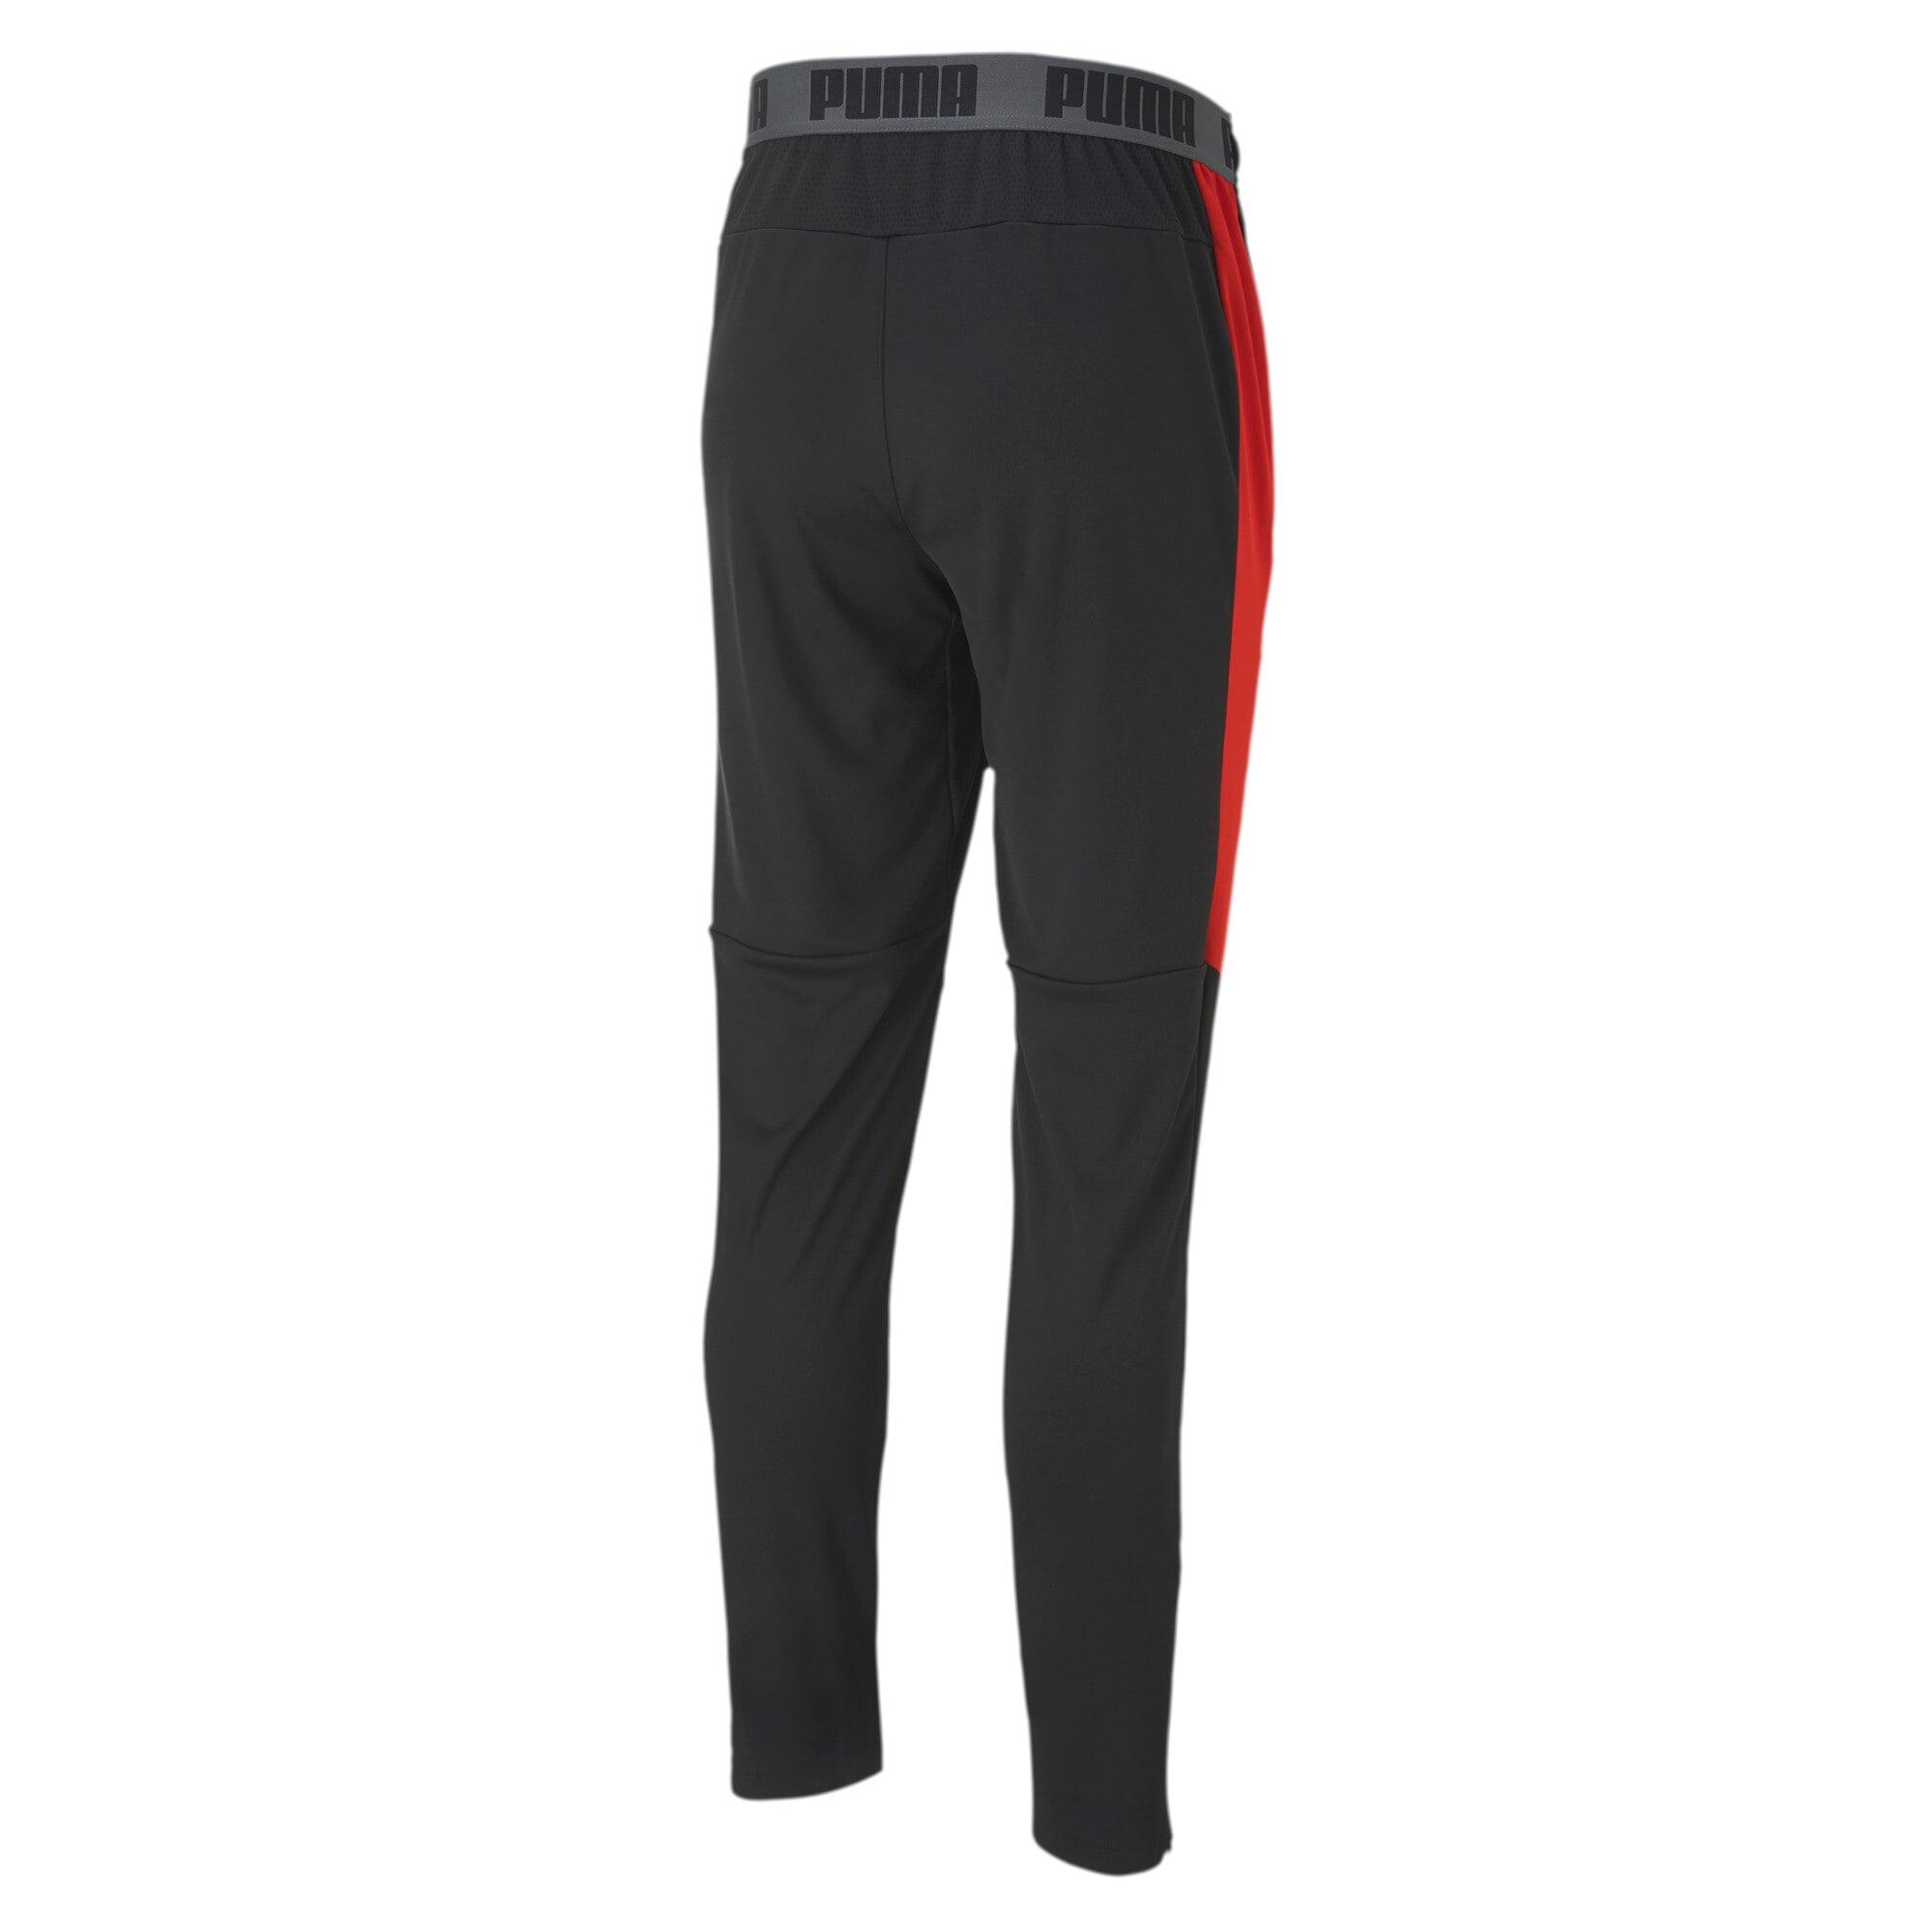 Thumbnail 3 of Men's Speed Pants, Puma Black-Puma Red, medium